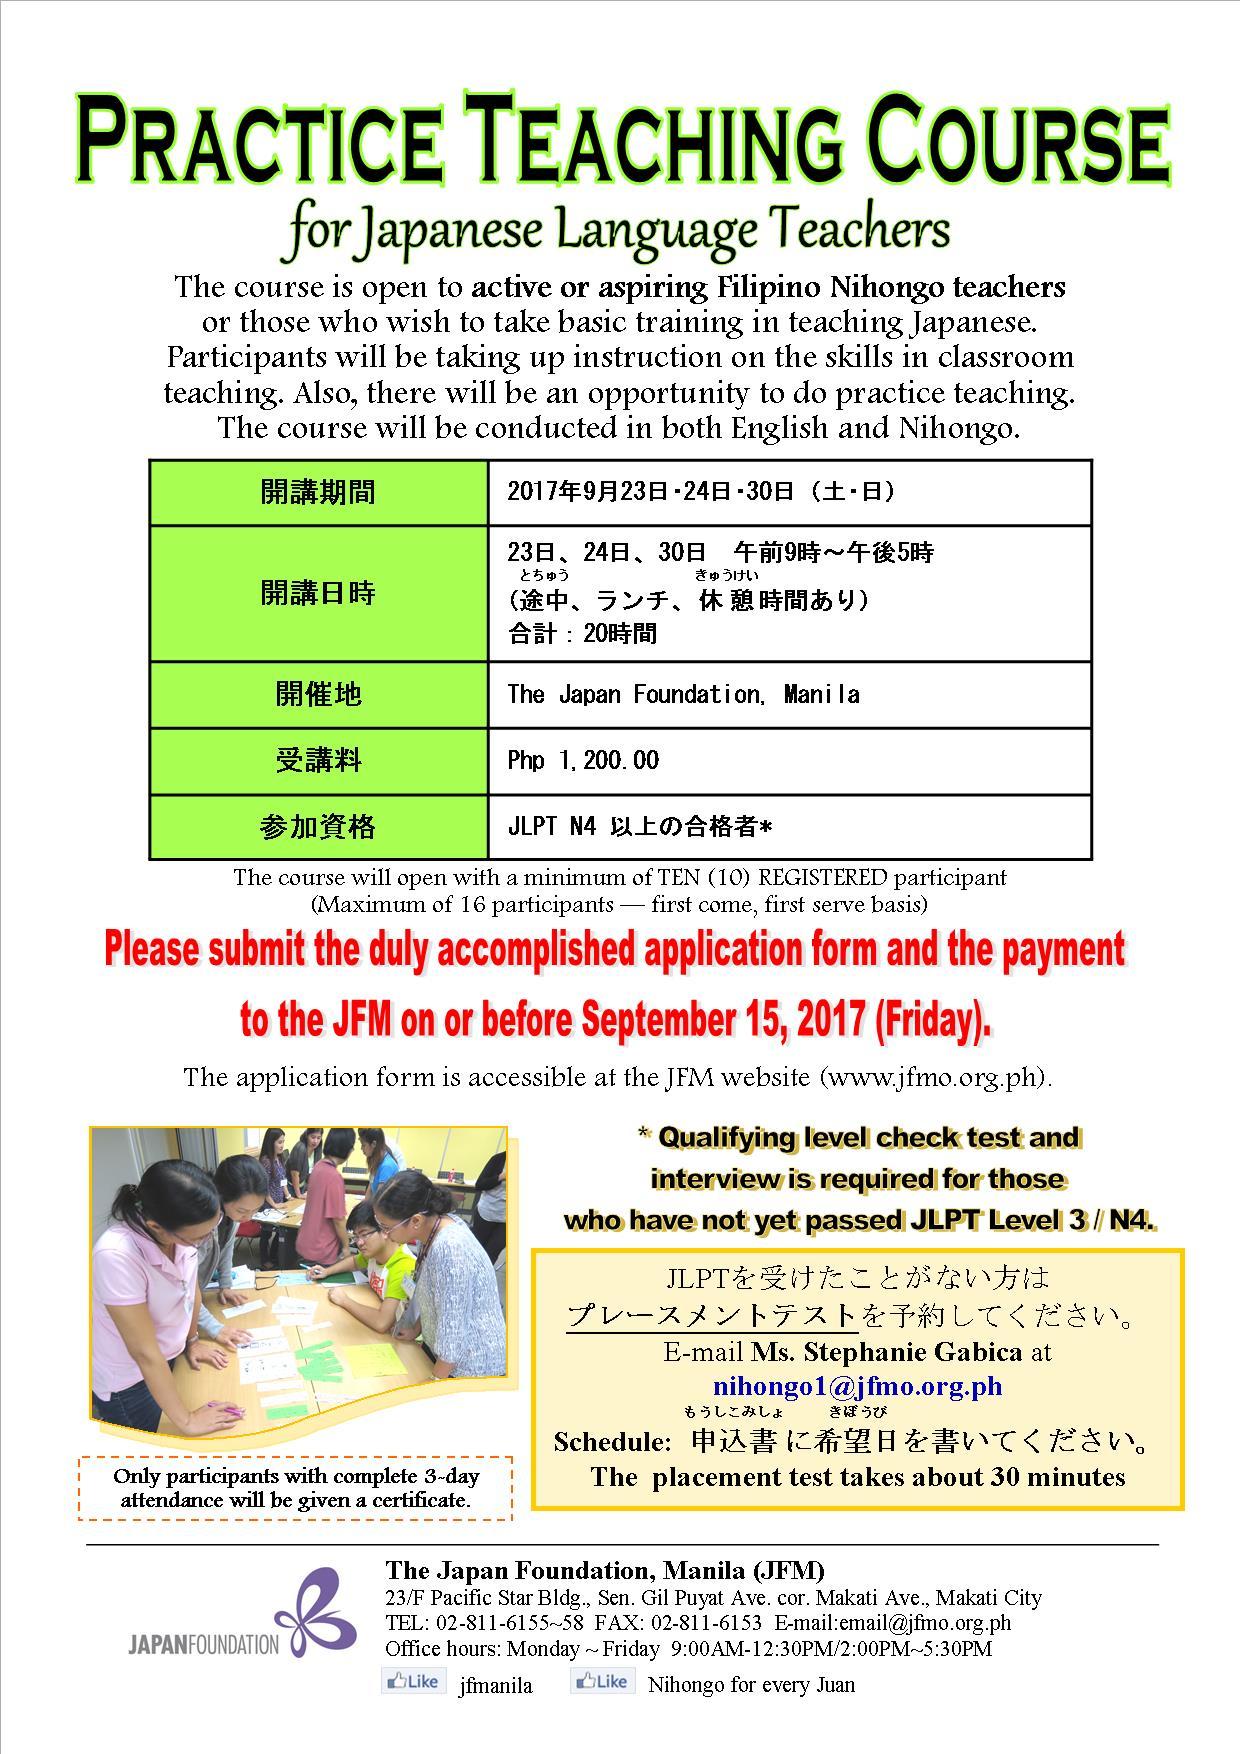 Practice Teaching Course in Manila – September 23, 24 & 30, 2017